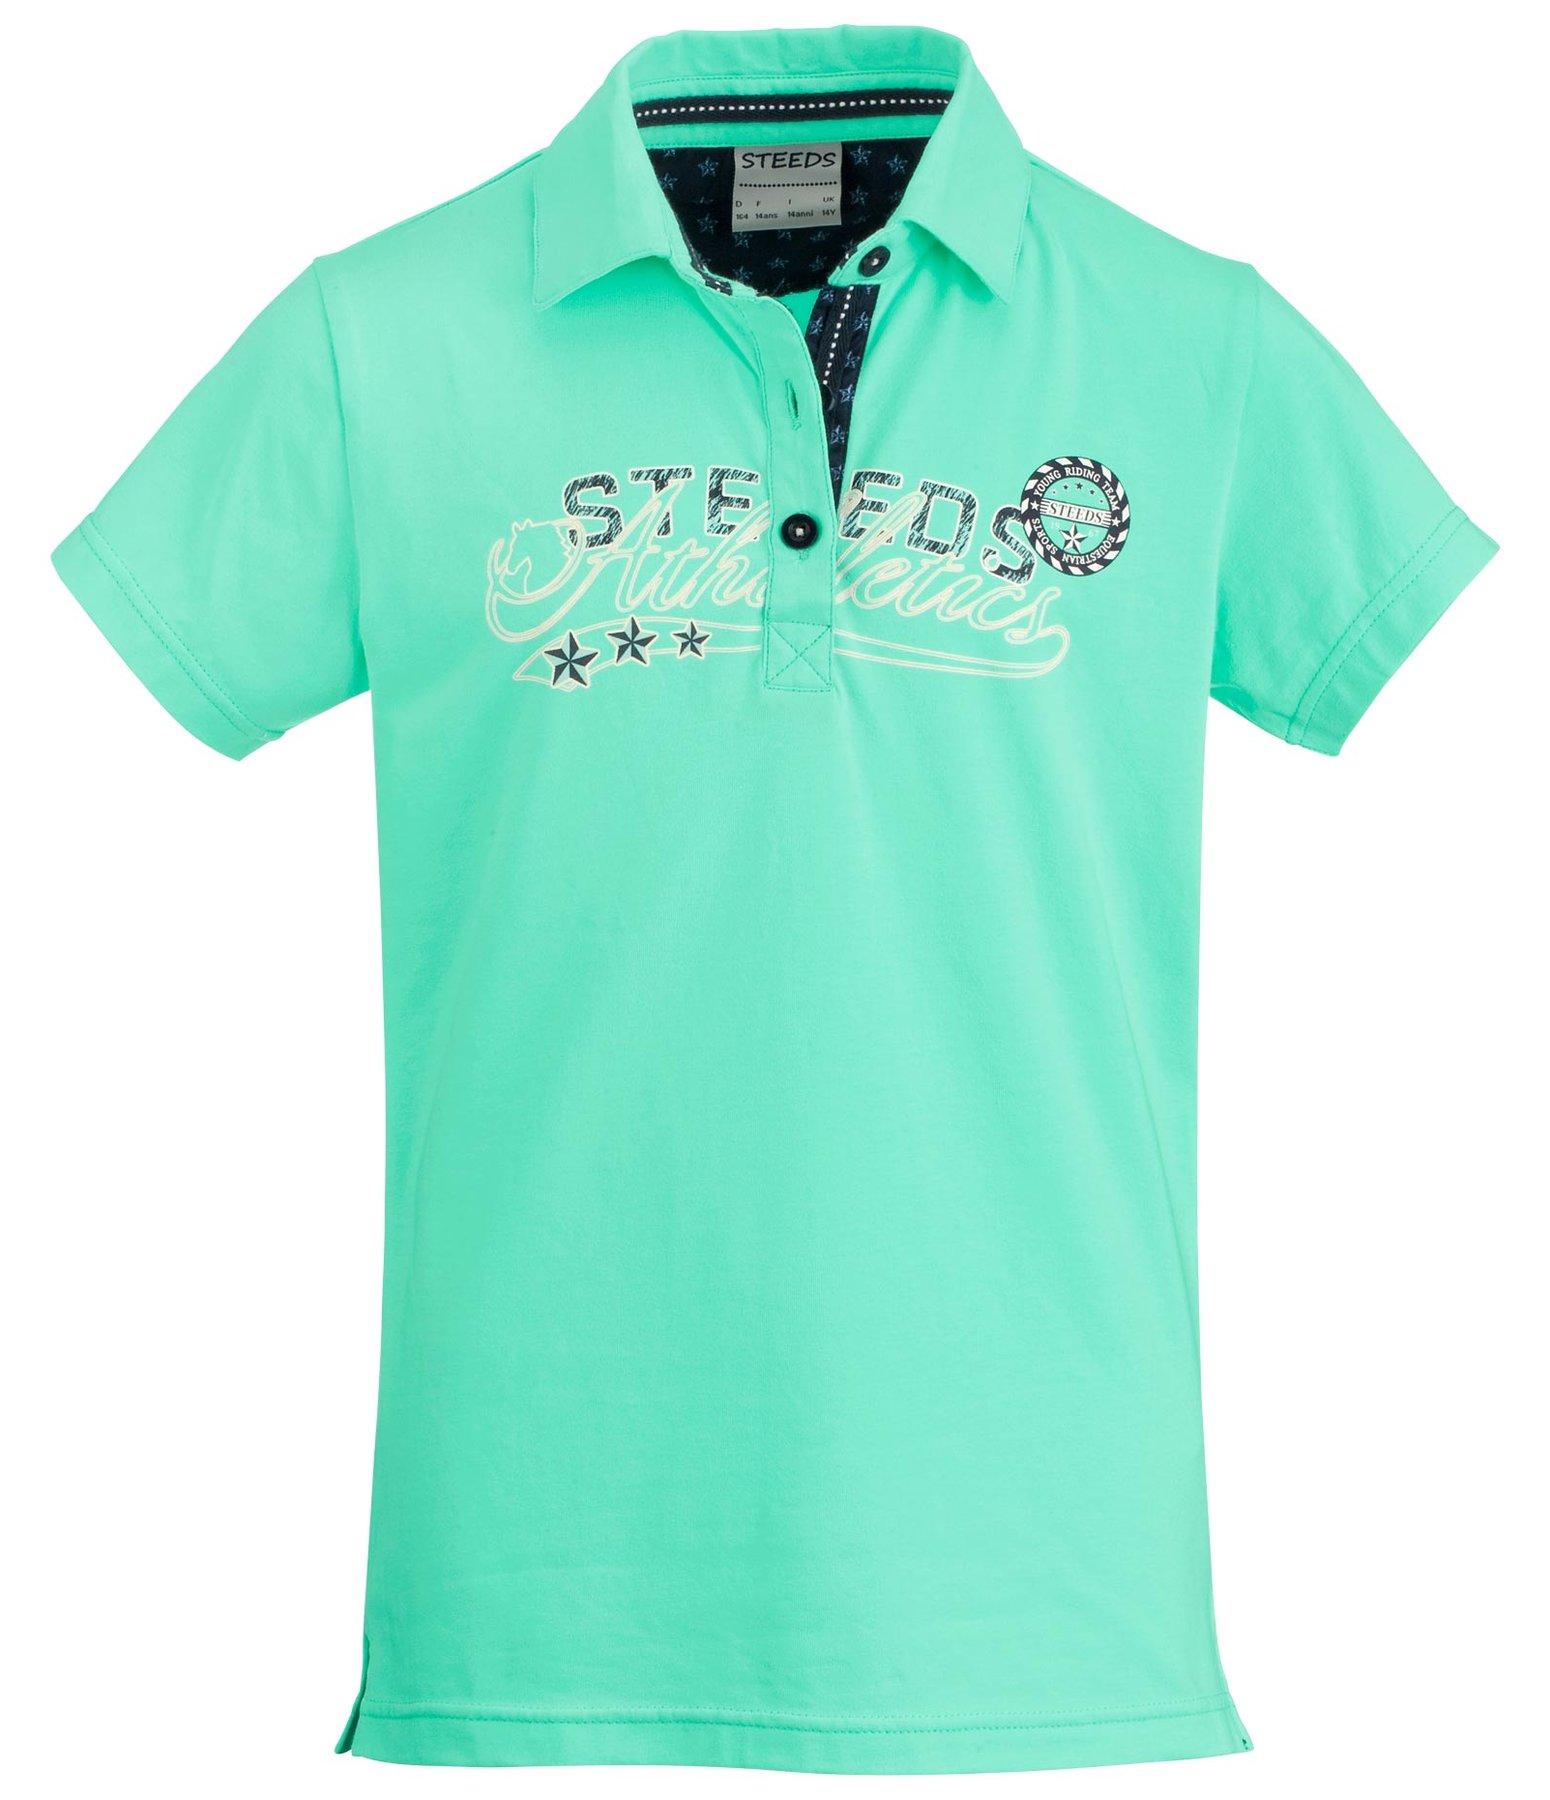 5a37ca3b08df Children s Polo Shirt Inga - Children s Shirts - Kramer Equestrian